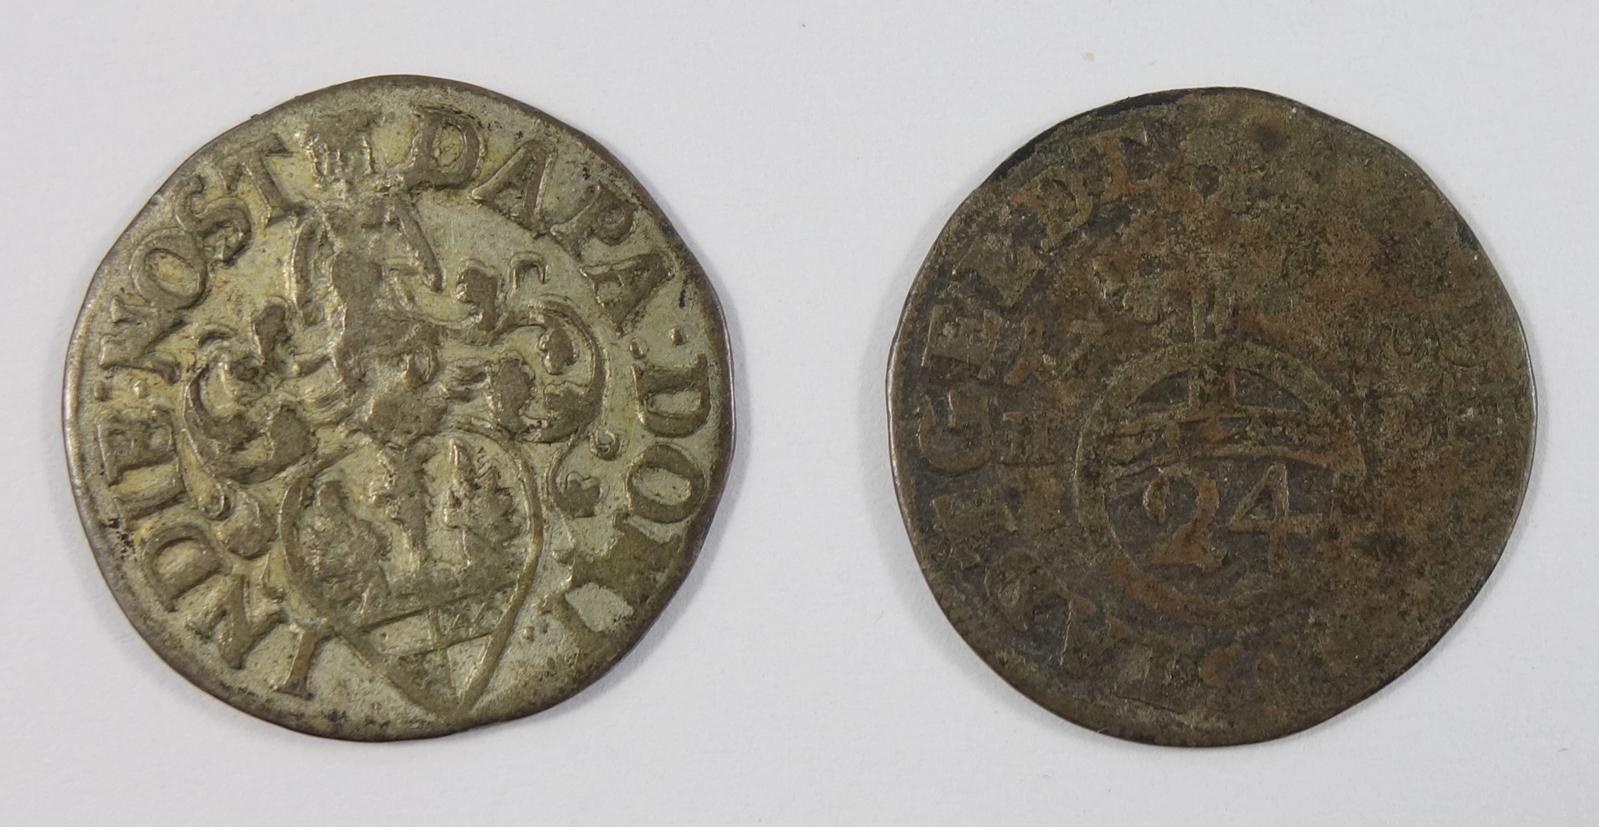 2* 1/24 Taler 1706, Hildesheim Stadt, s-ss2 * 1/24 Taler 1706, Hildesheim - Bild 2 aus 2